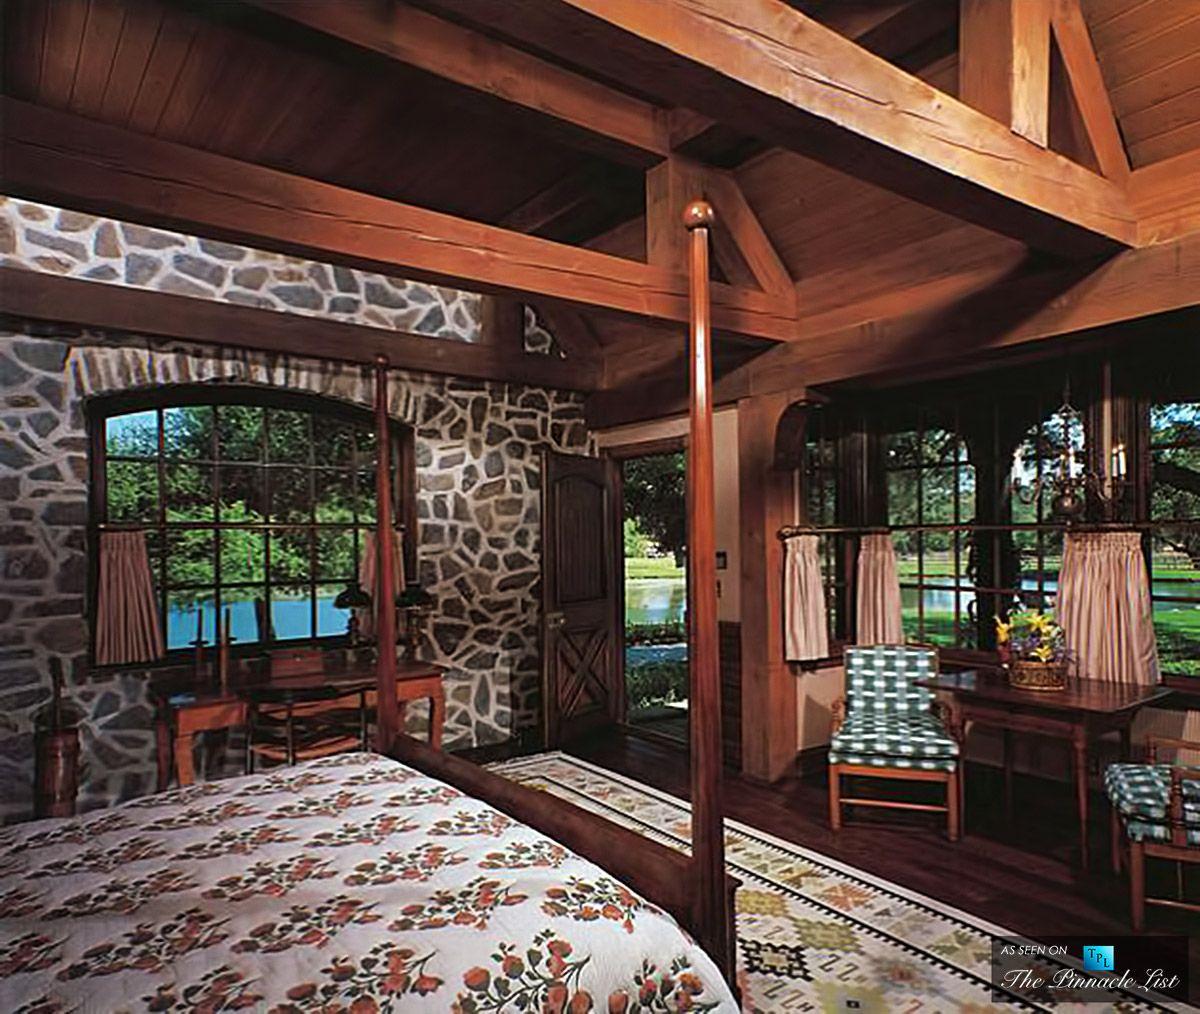 Luxury Farm Homes: Michael Jacksons Neverland Valley Ranch